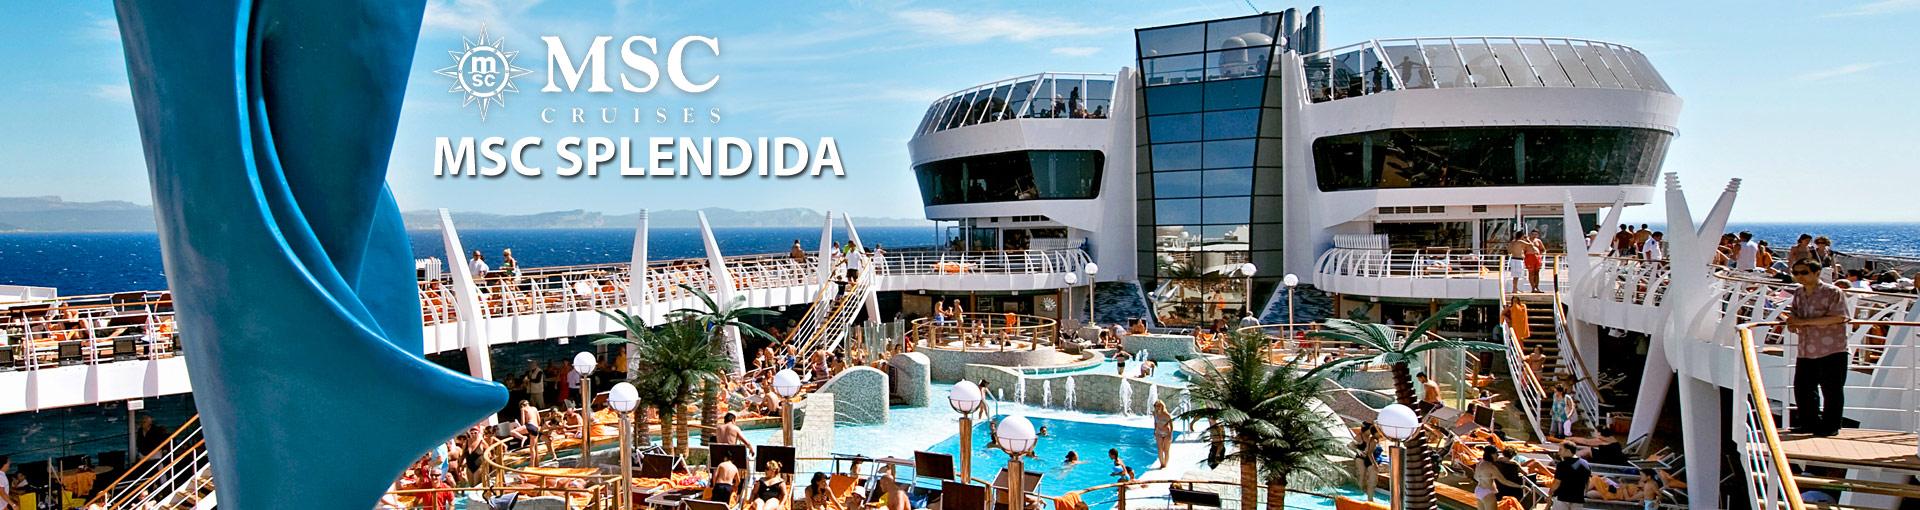 MSC Cruises MSC Splendida cruise ship